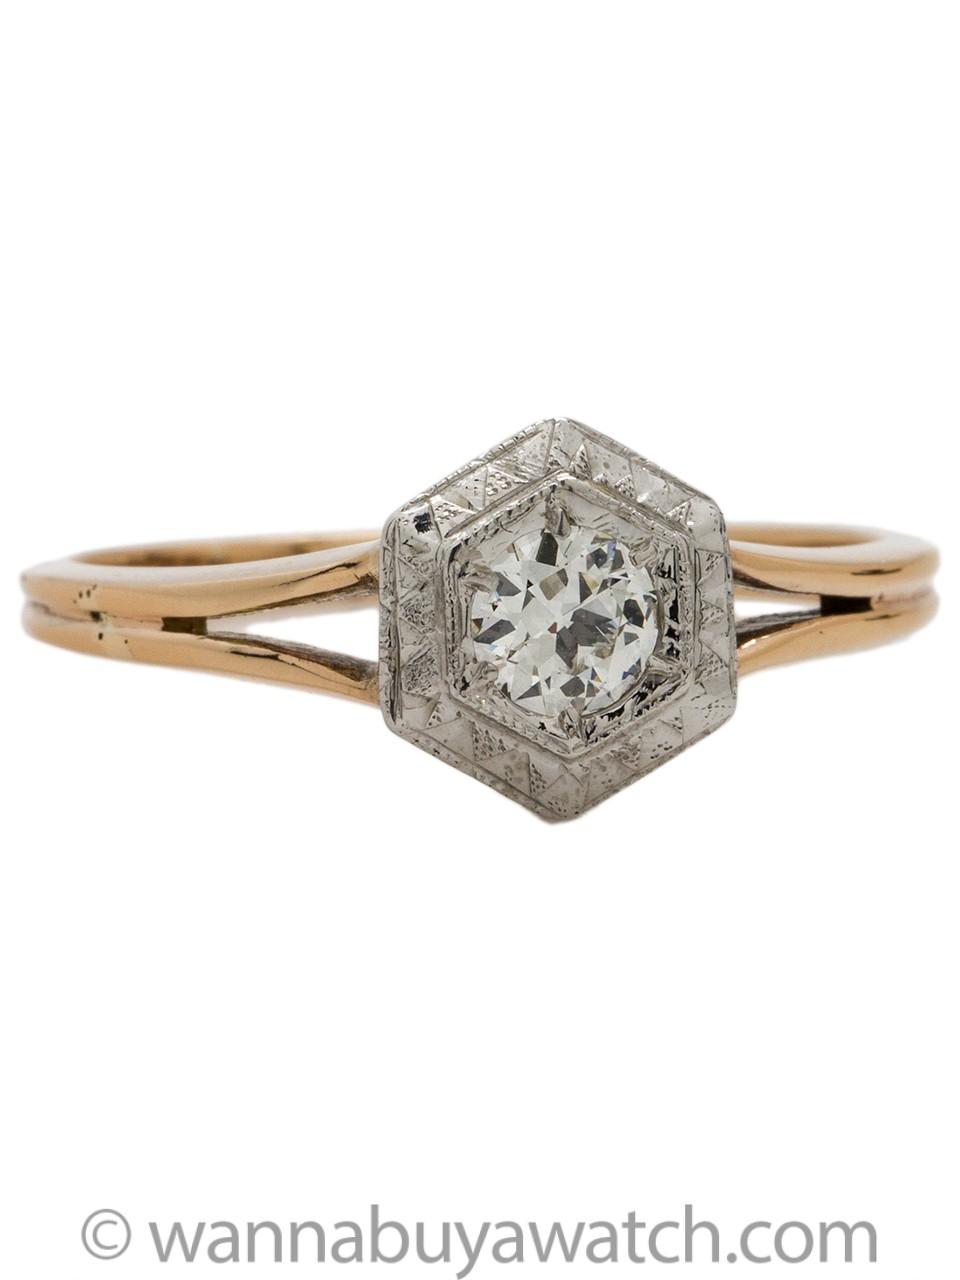 Vintage Engagement Ring 14K 0.40ct OEC H-SI1 circa 1920s